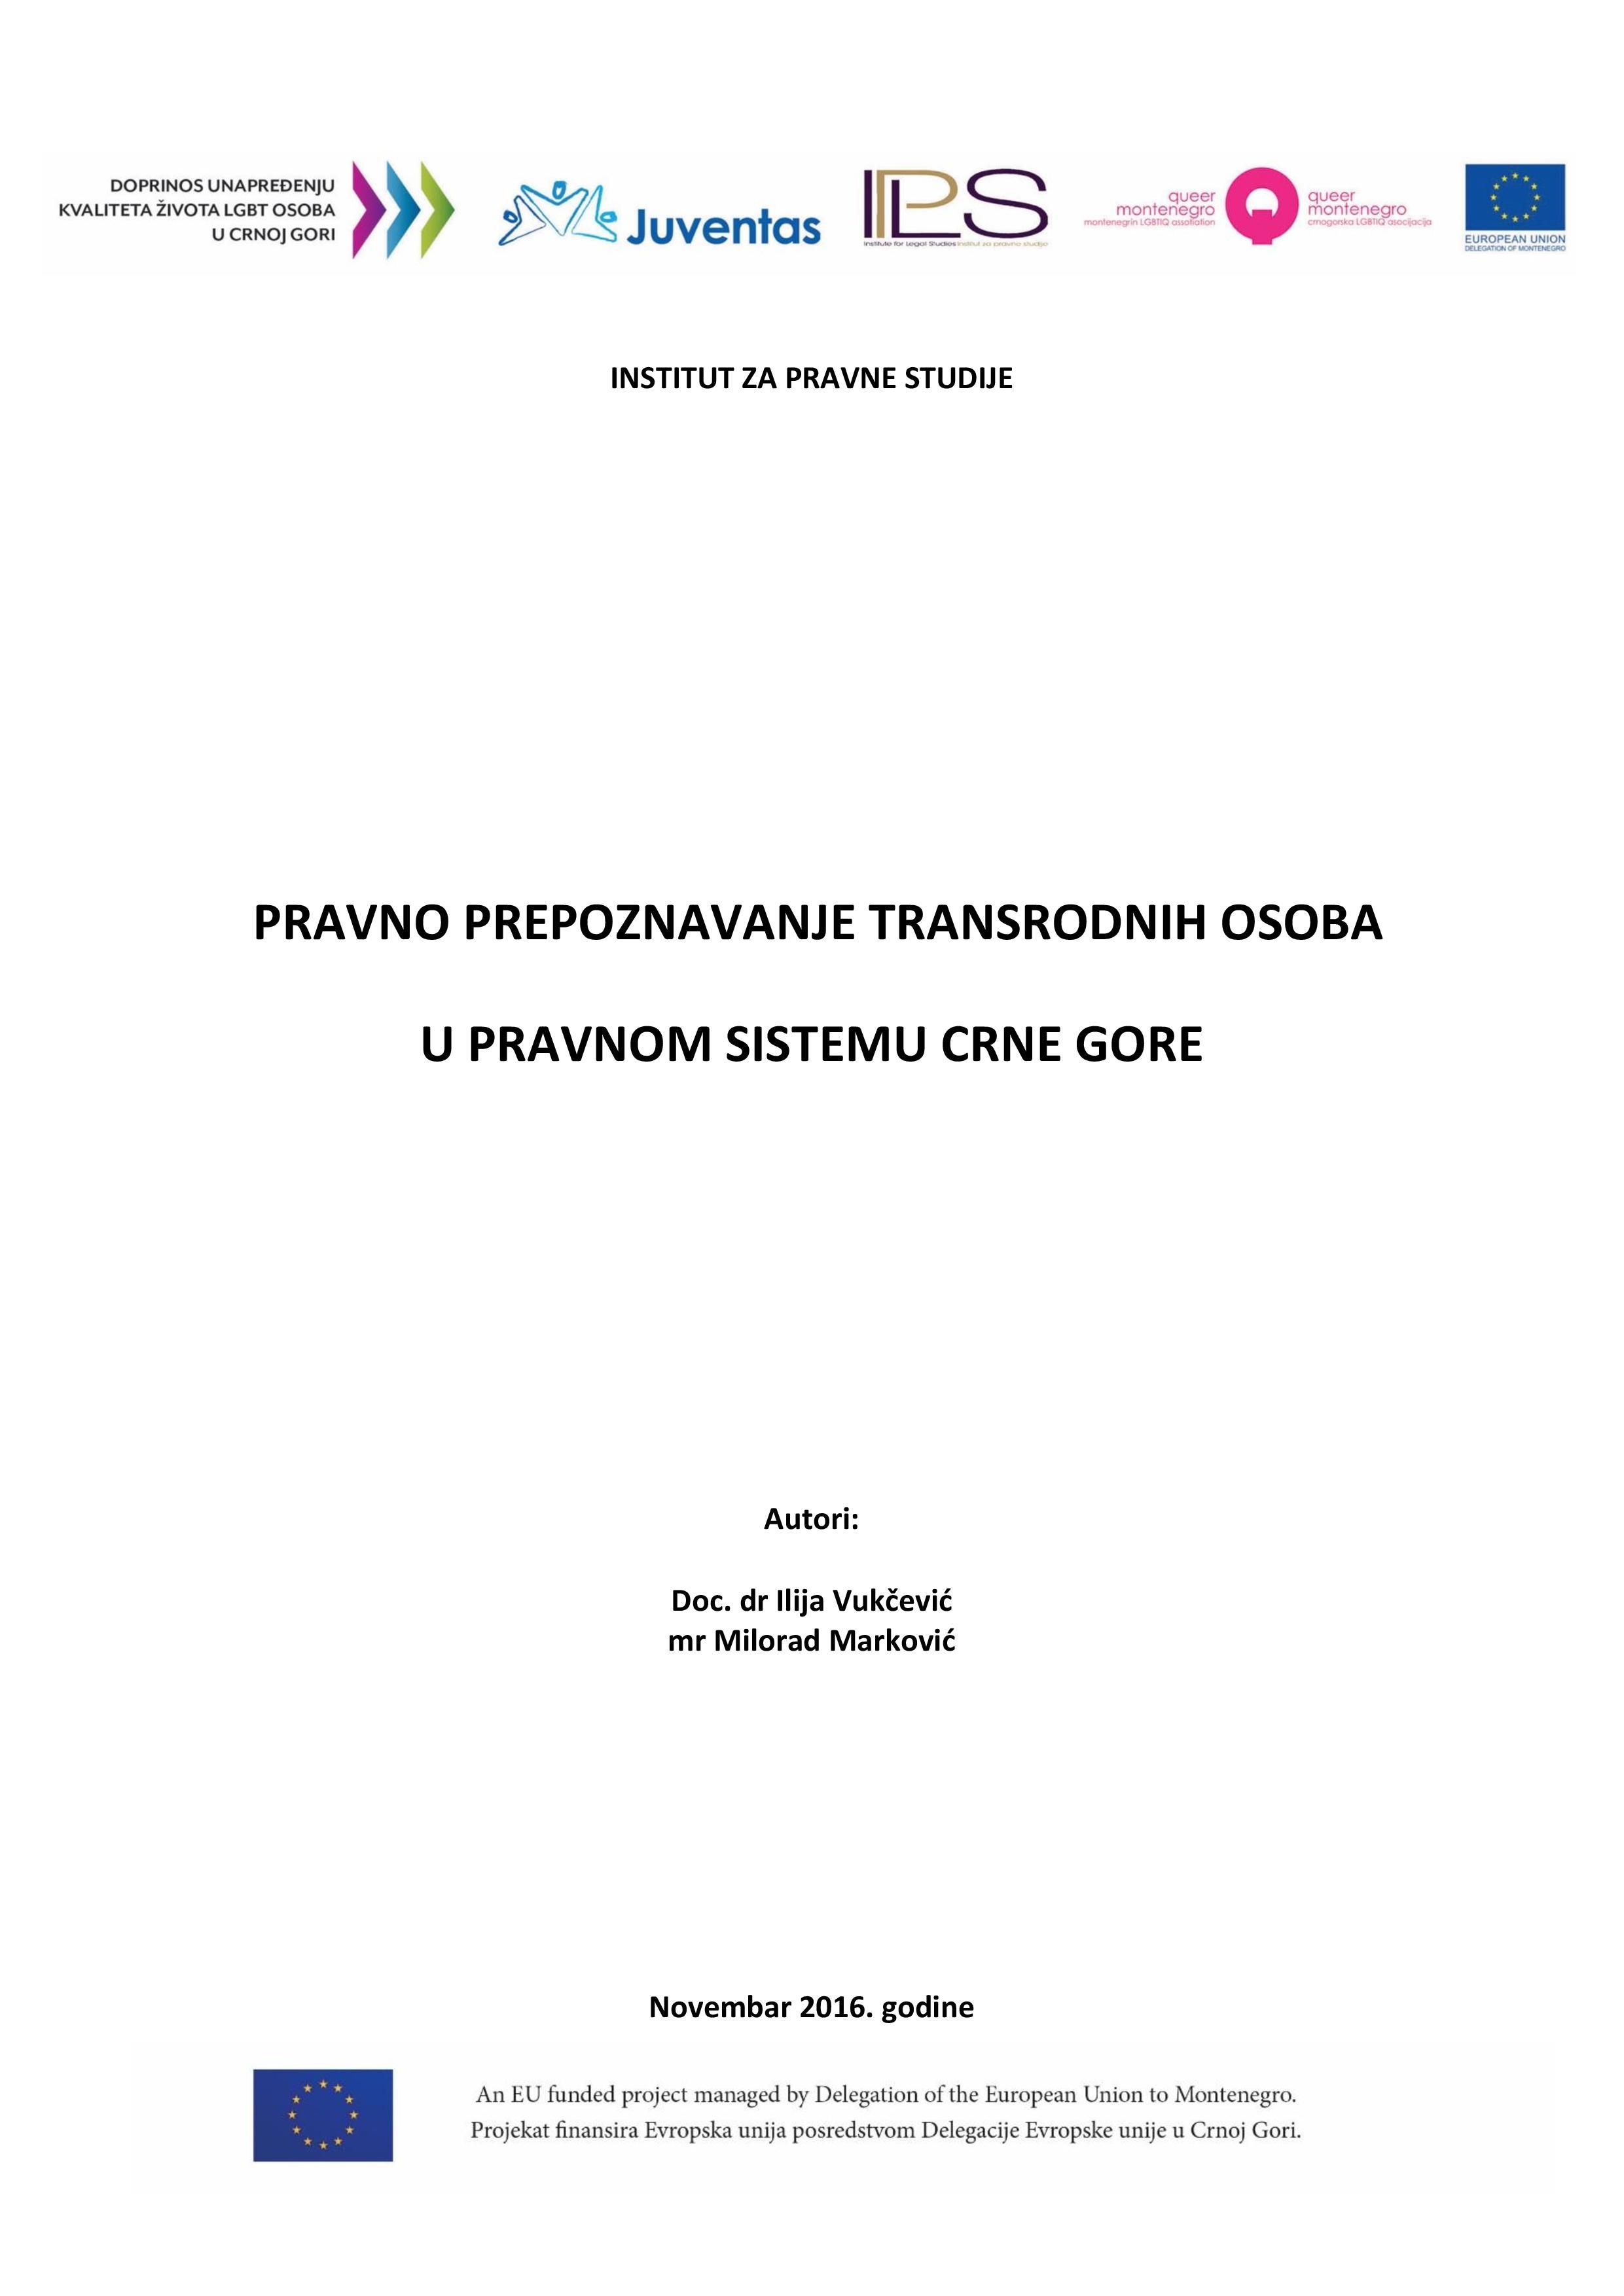 PRAVNO PREPOZNAVANJE TRANSRODNIH OSOBA U PRAVNOM SISTEMU CRNE GORE final-page-001